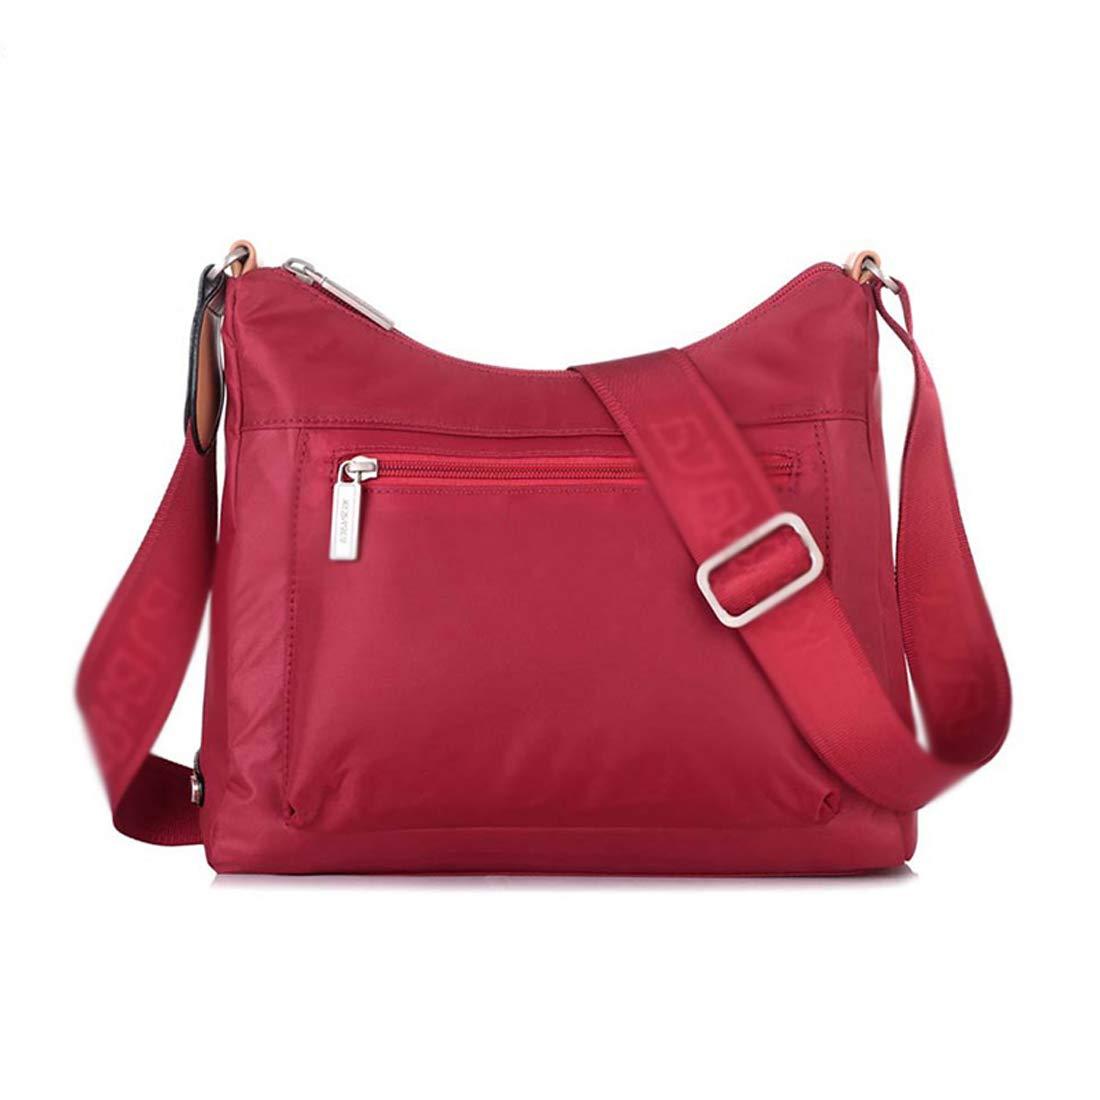 RMXMY Fashion Canvas Bag Female Casual Waterproof Oxford Cloth Travel Diagonal Simple Personality Creative Wild Backpack Travel Bag